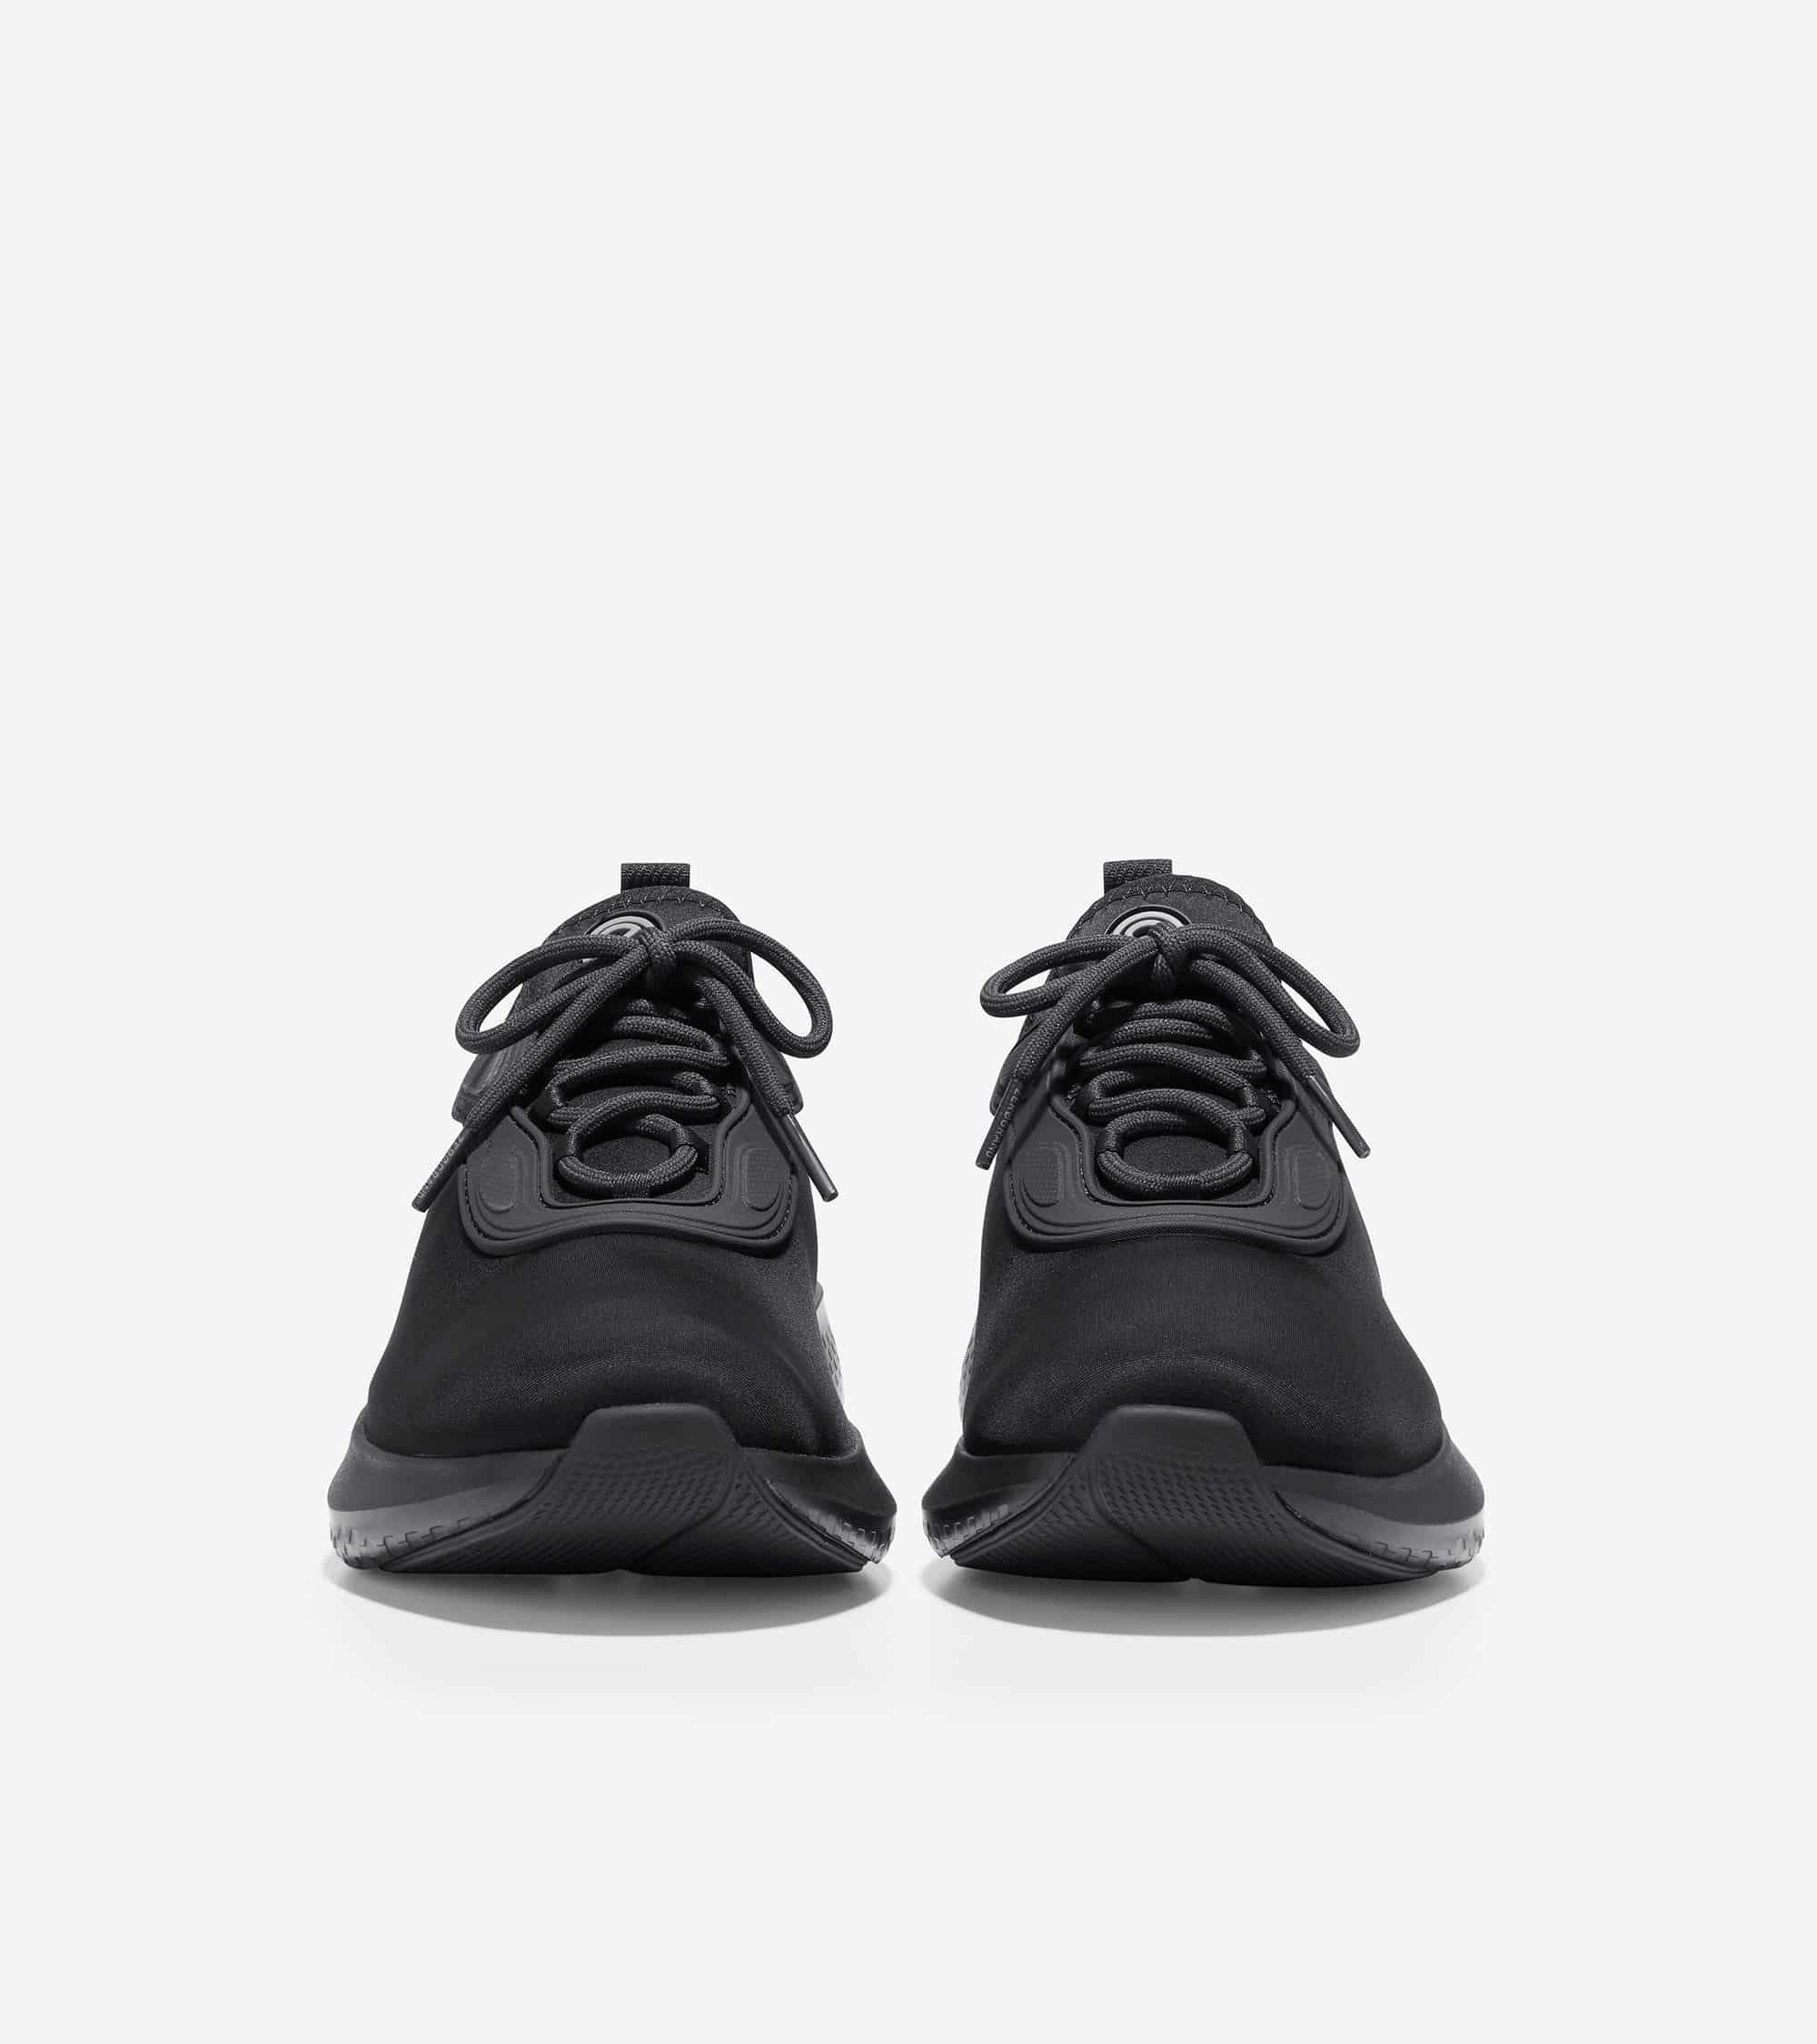 Cole Haan ZERØGRAND Changepace Sneaker Black-Black